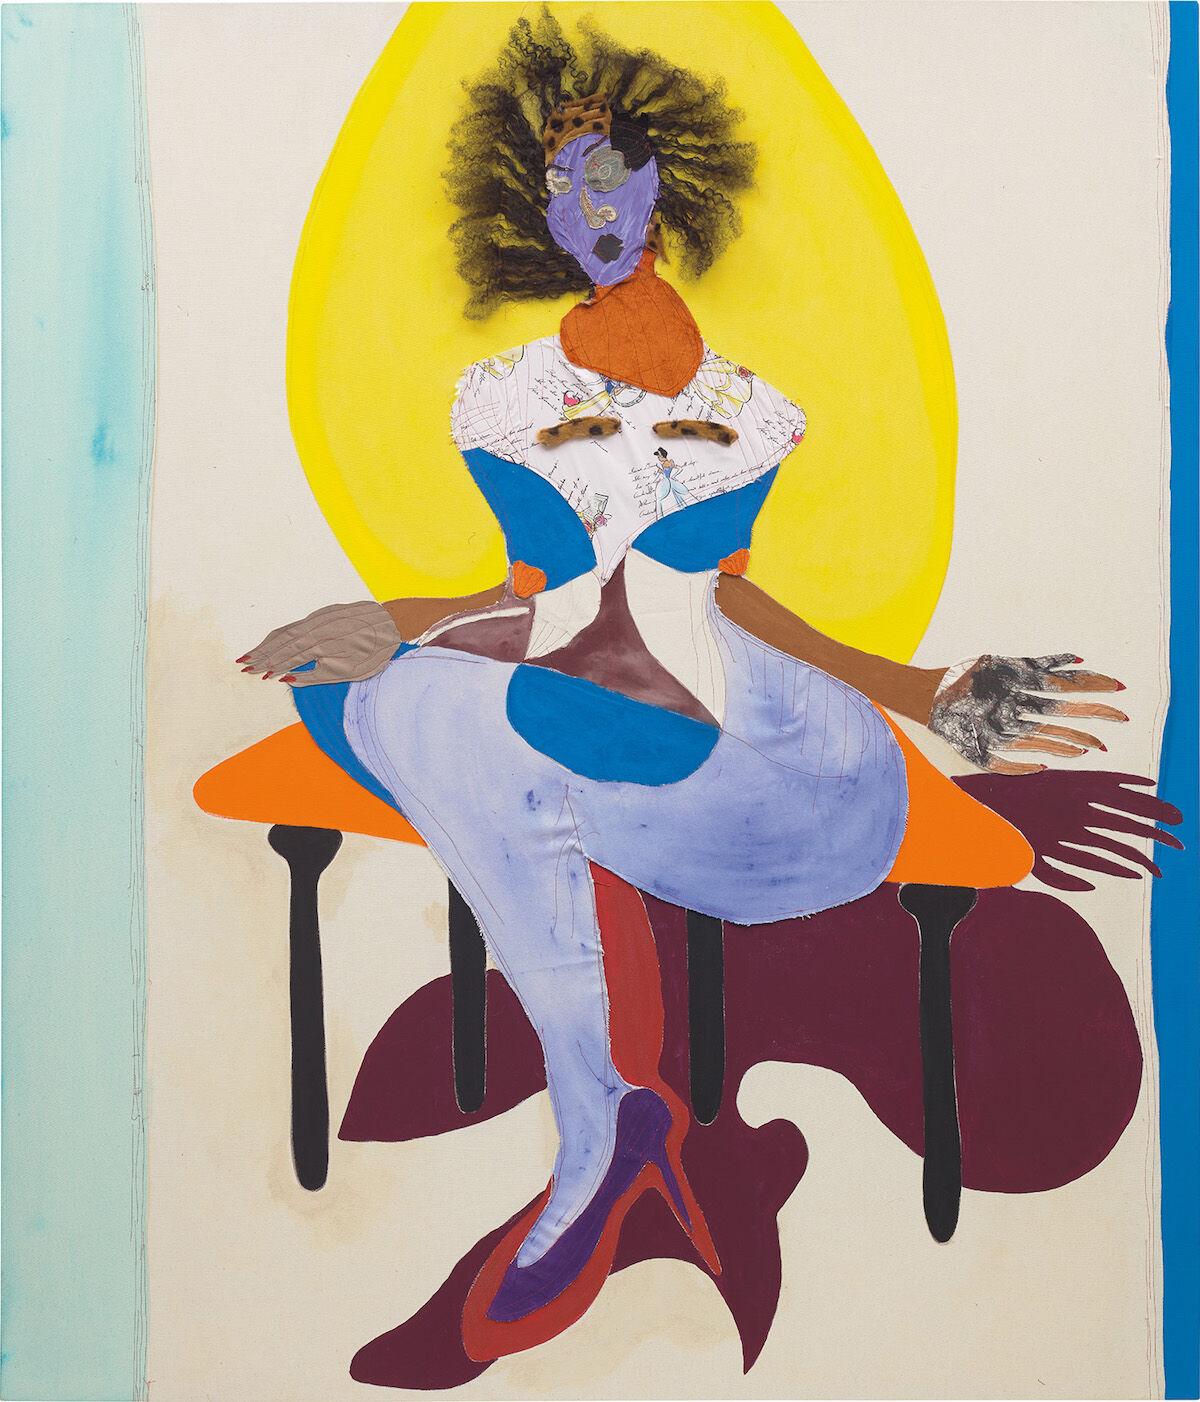 Tschabalala Self, Princess, 2017. Sold for £435,000 ($562,000). Courtesy Phillips.